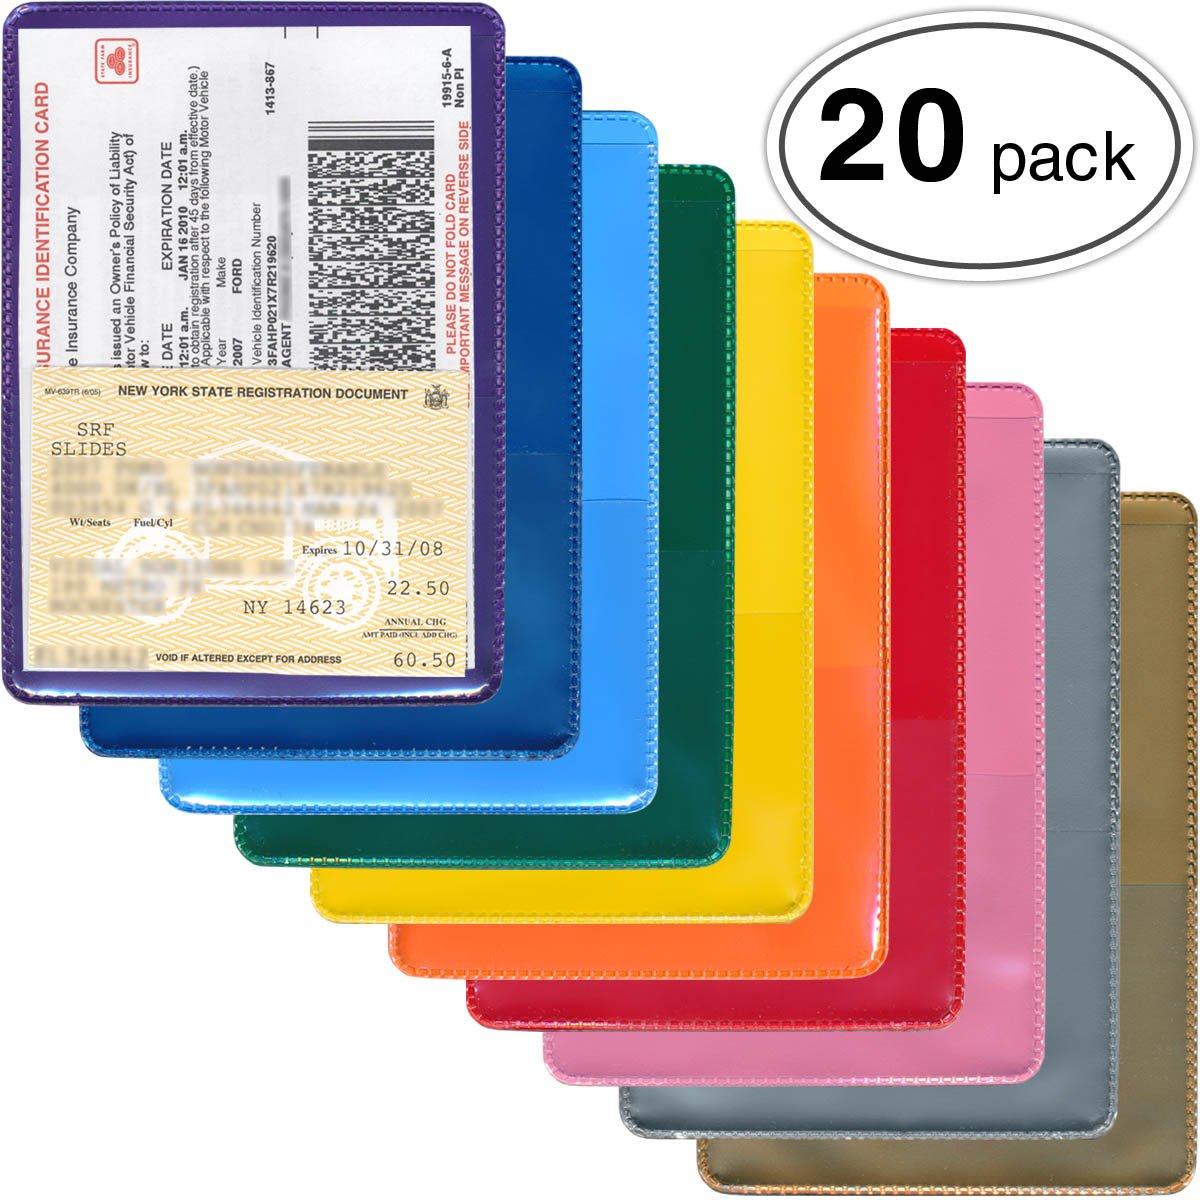 StoreSMART - Auto Insurance & ID Card Holders - Variety 20-Pack - RFS20VP-2